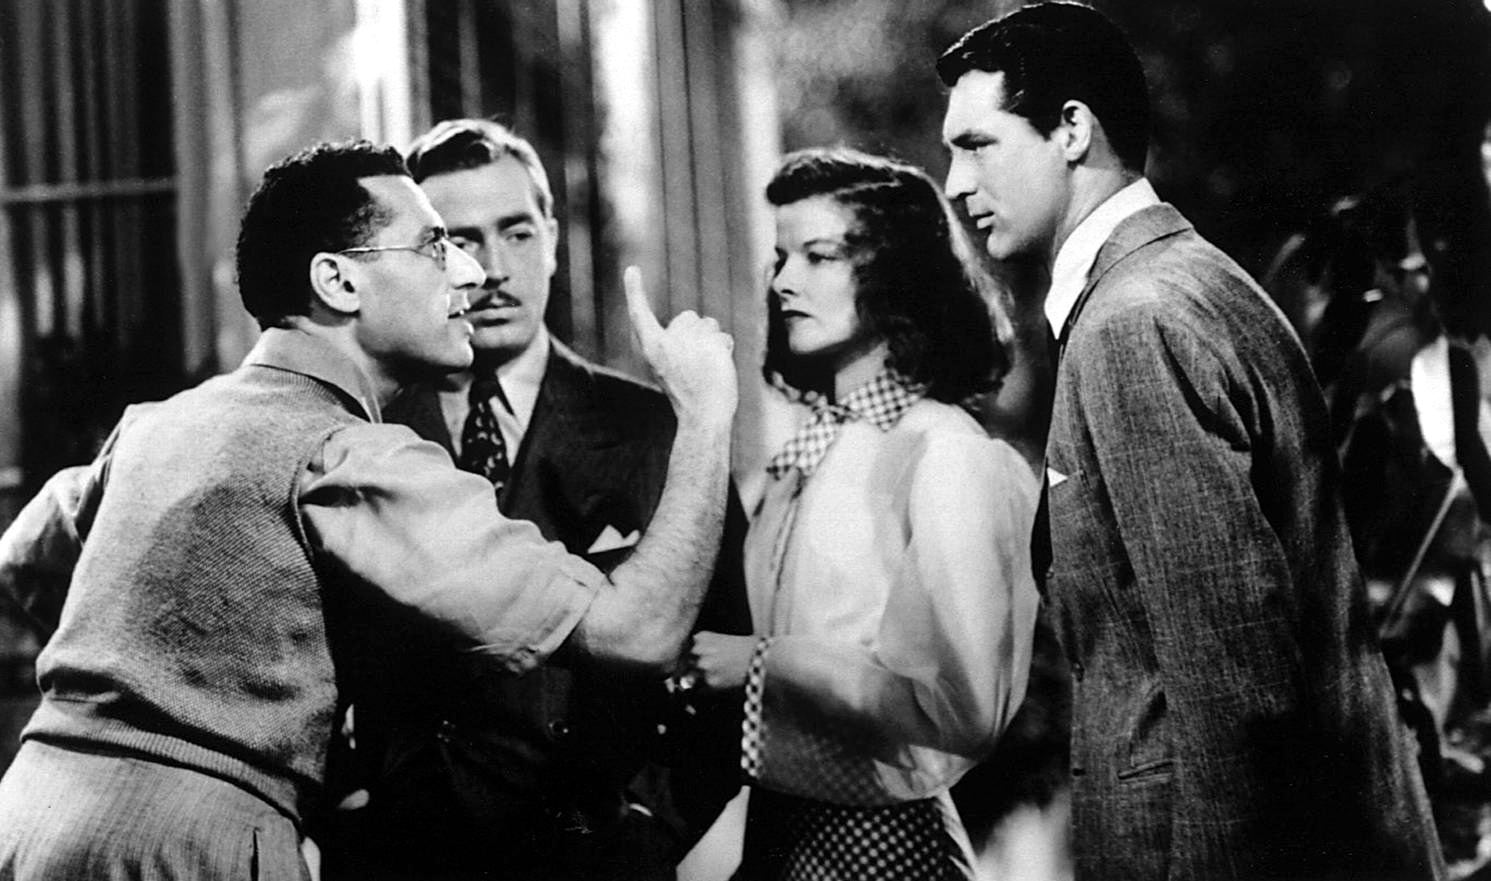 The Philadelphia Story [1940]